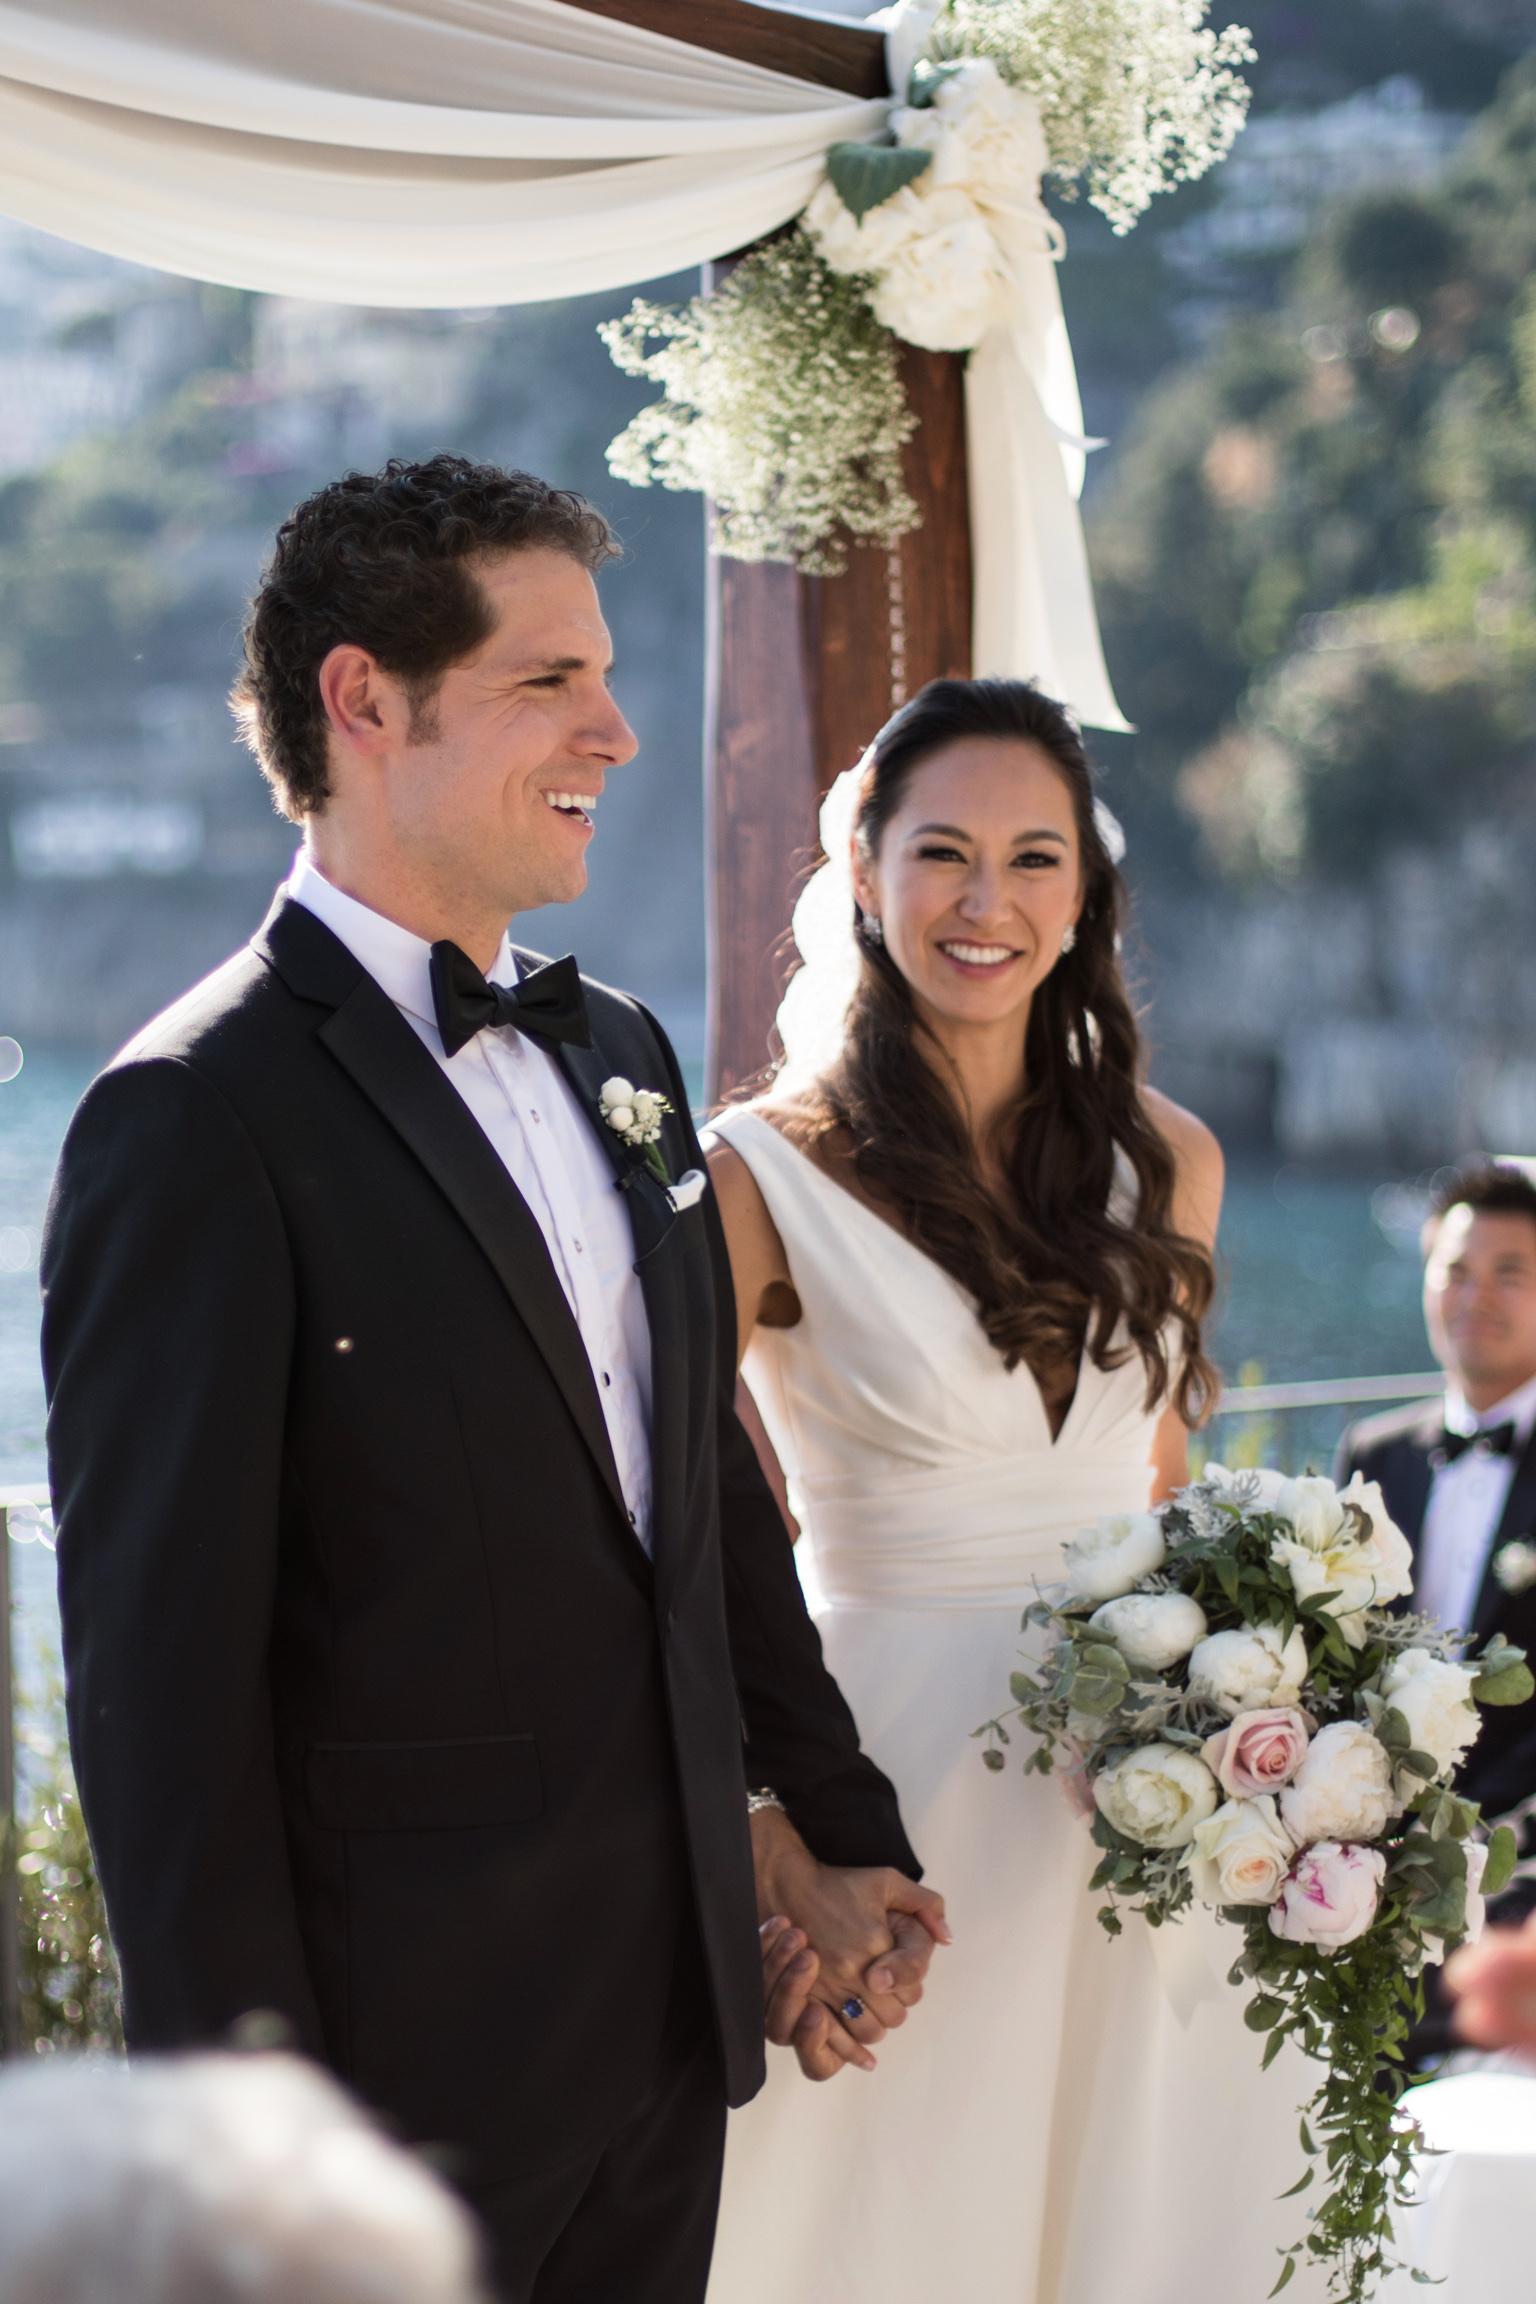 https://www.weddingamalfi.com/wp-content/uploads/Nathalie-and-Benjamin-Wedding-in-Positano-Italy-29.jpg